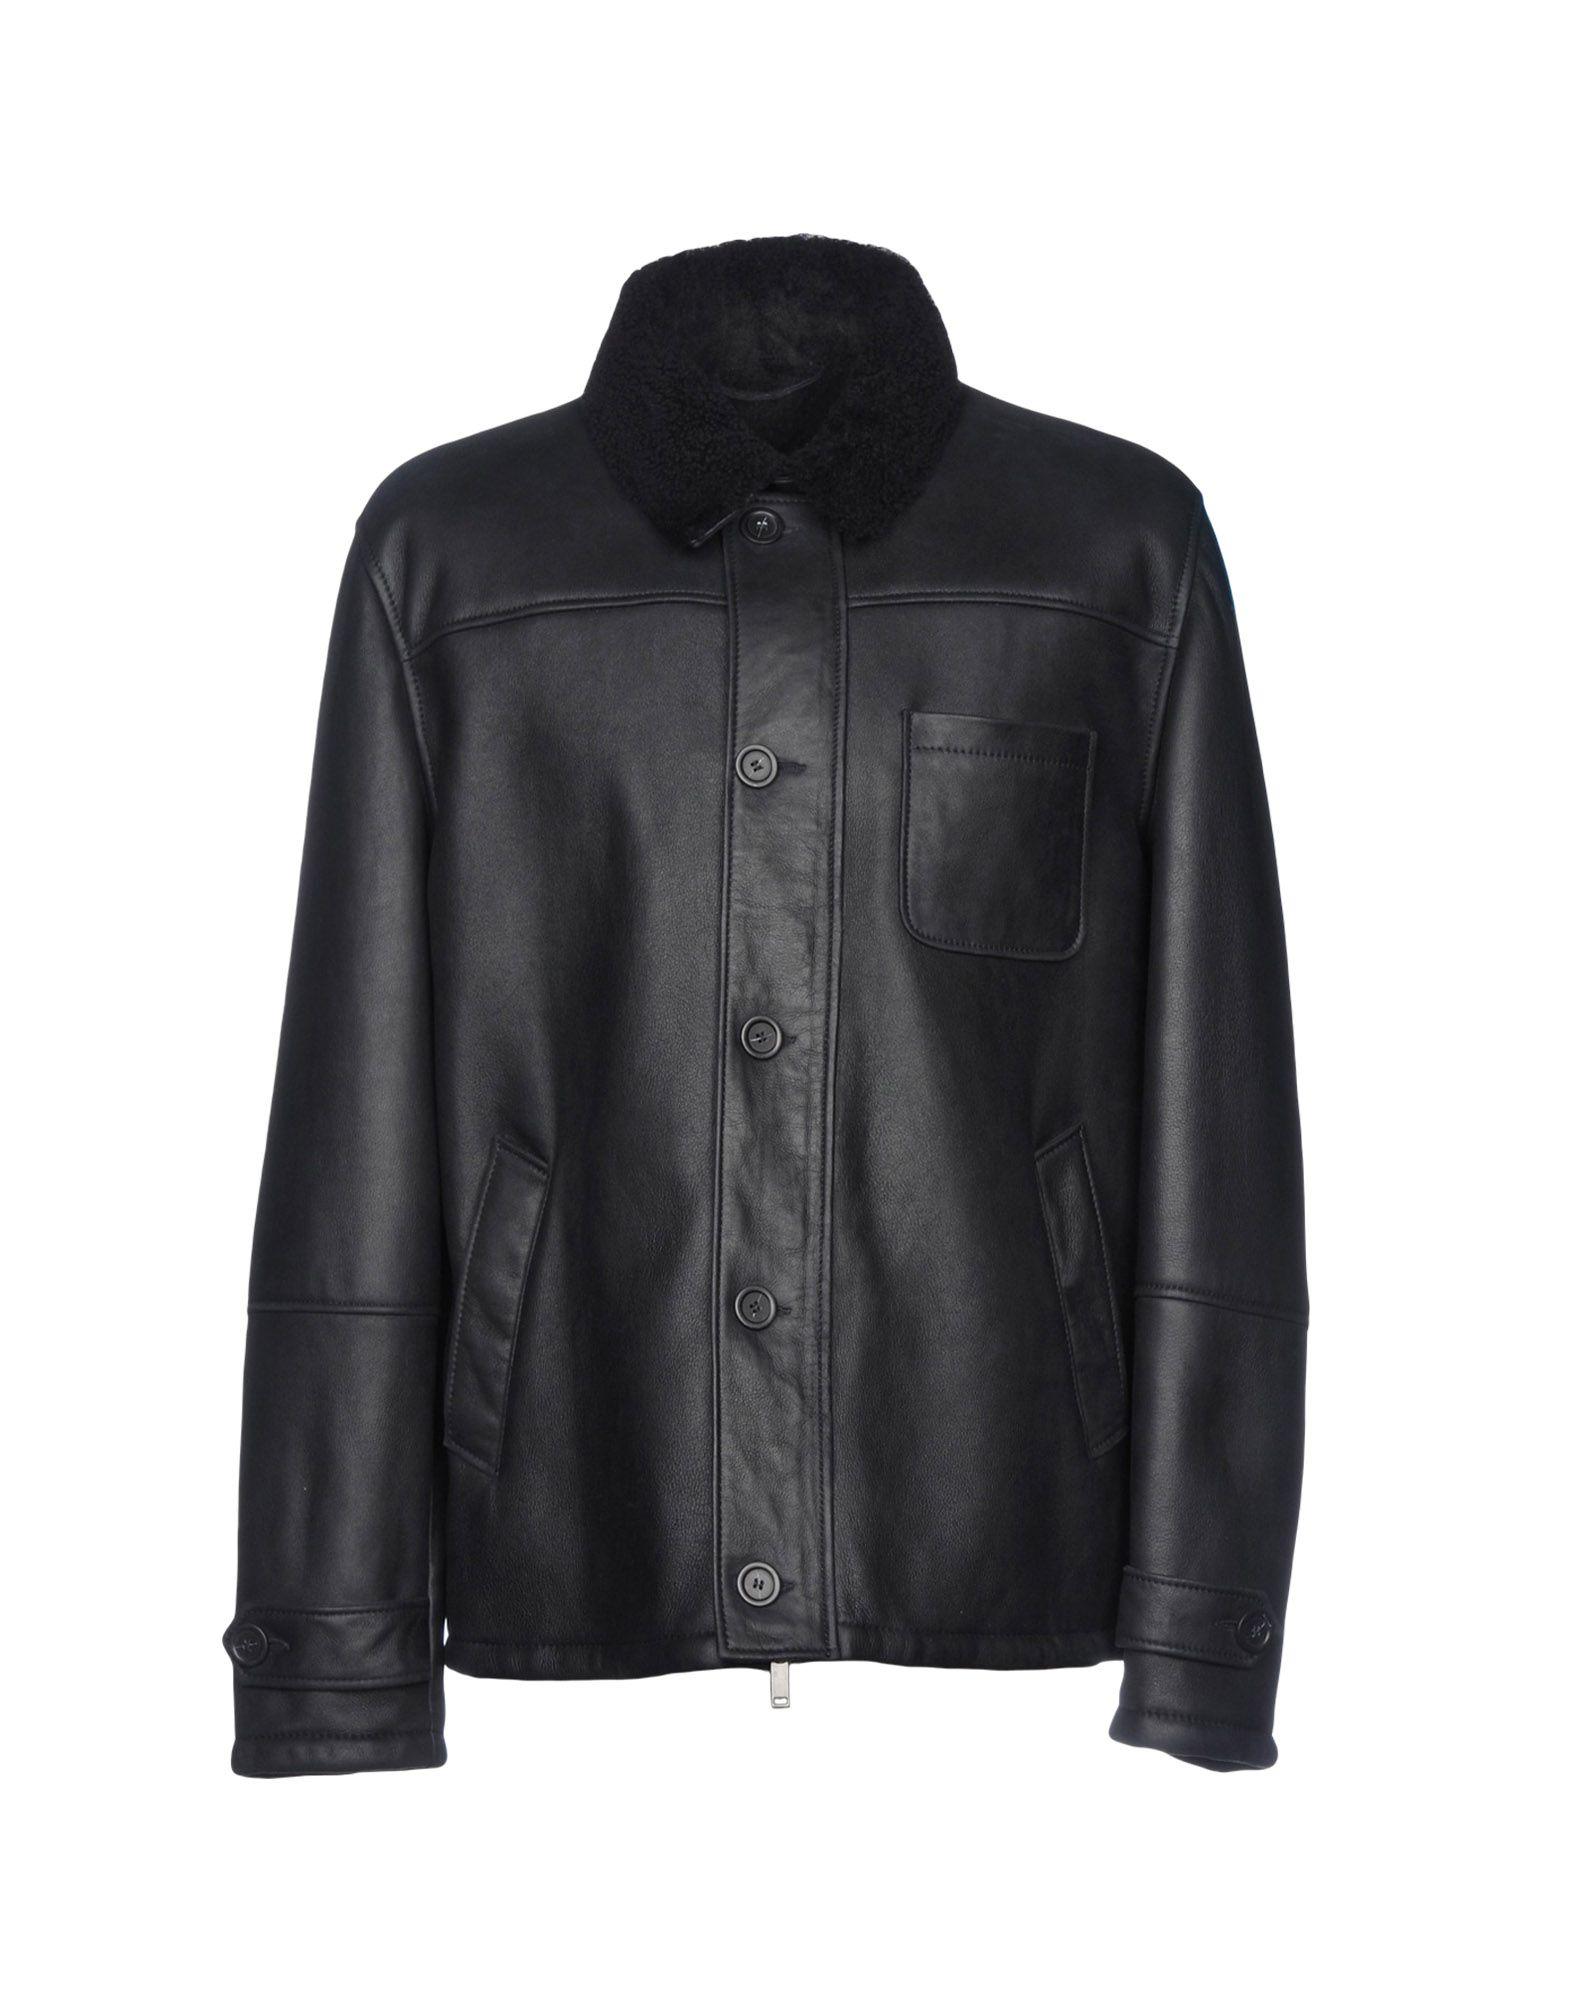 DESA NINETEENSEVENTYTWO Jackets in Black